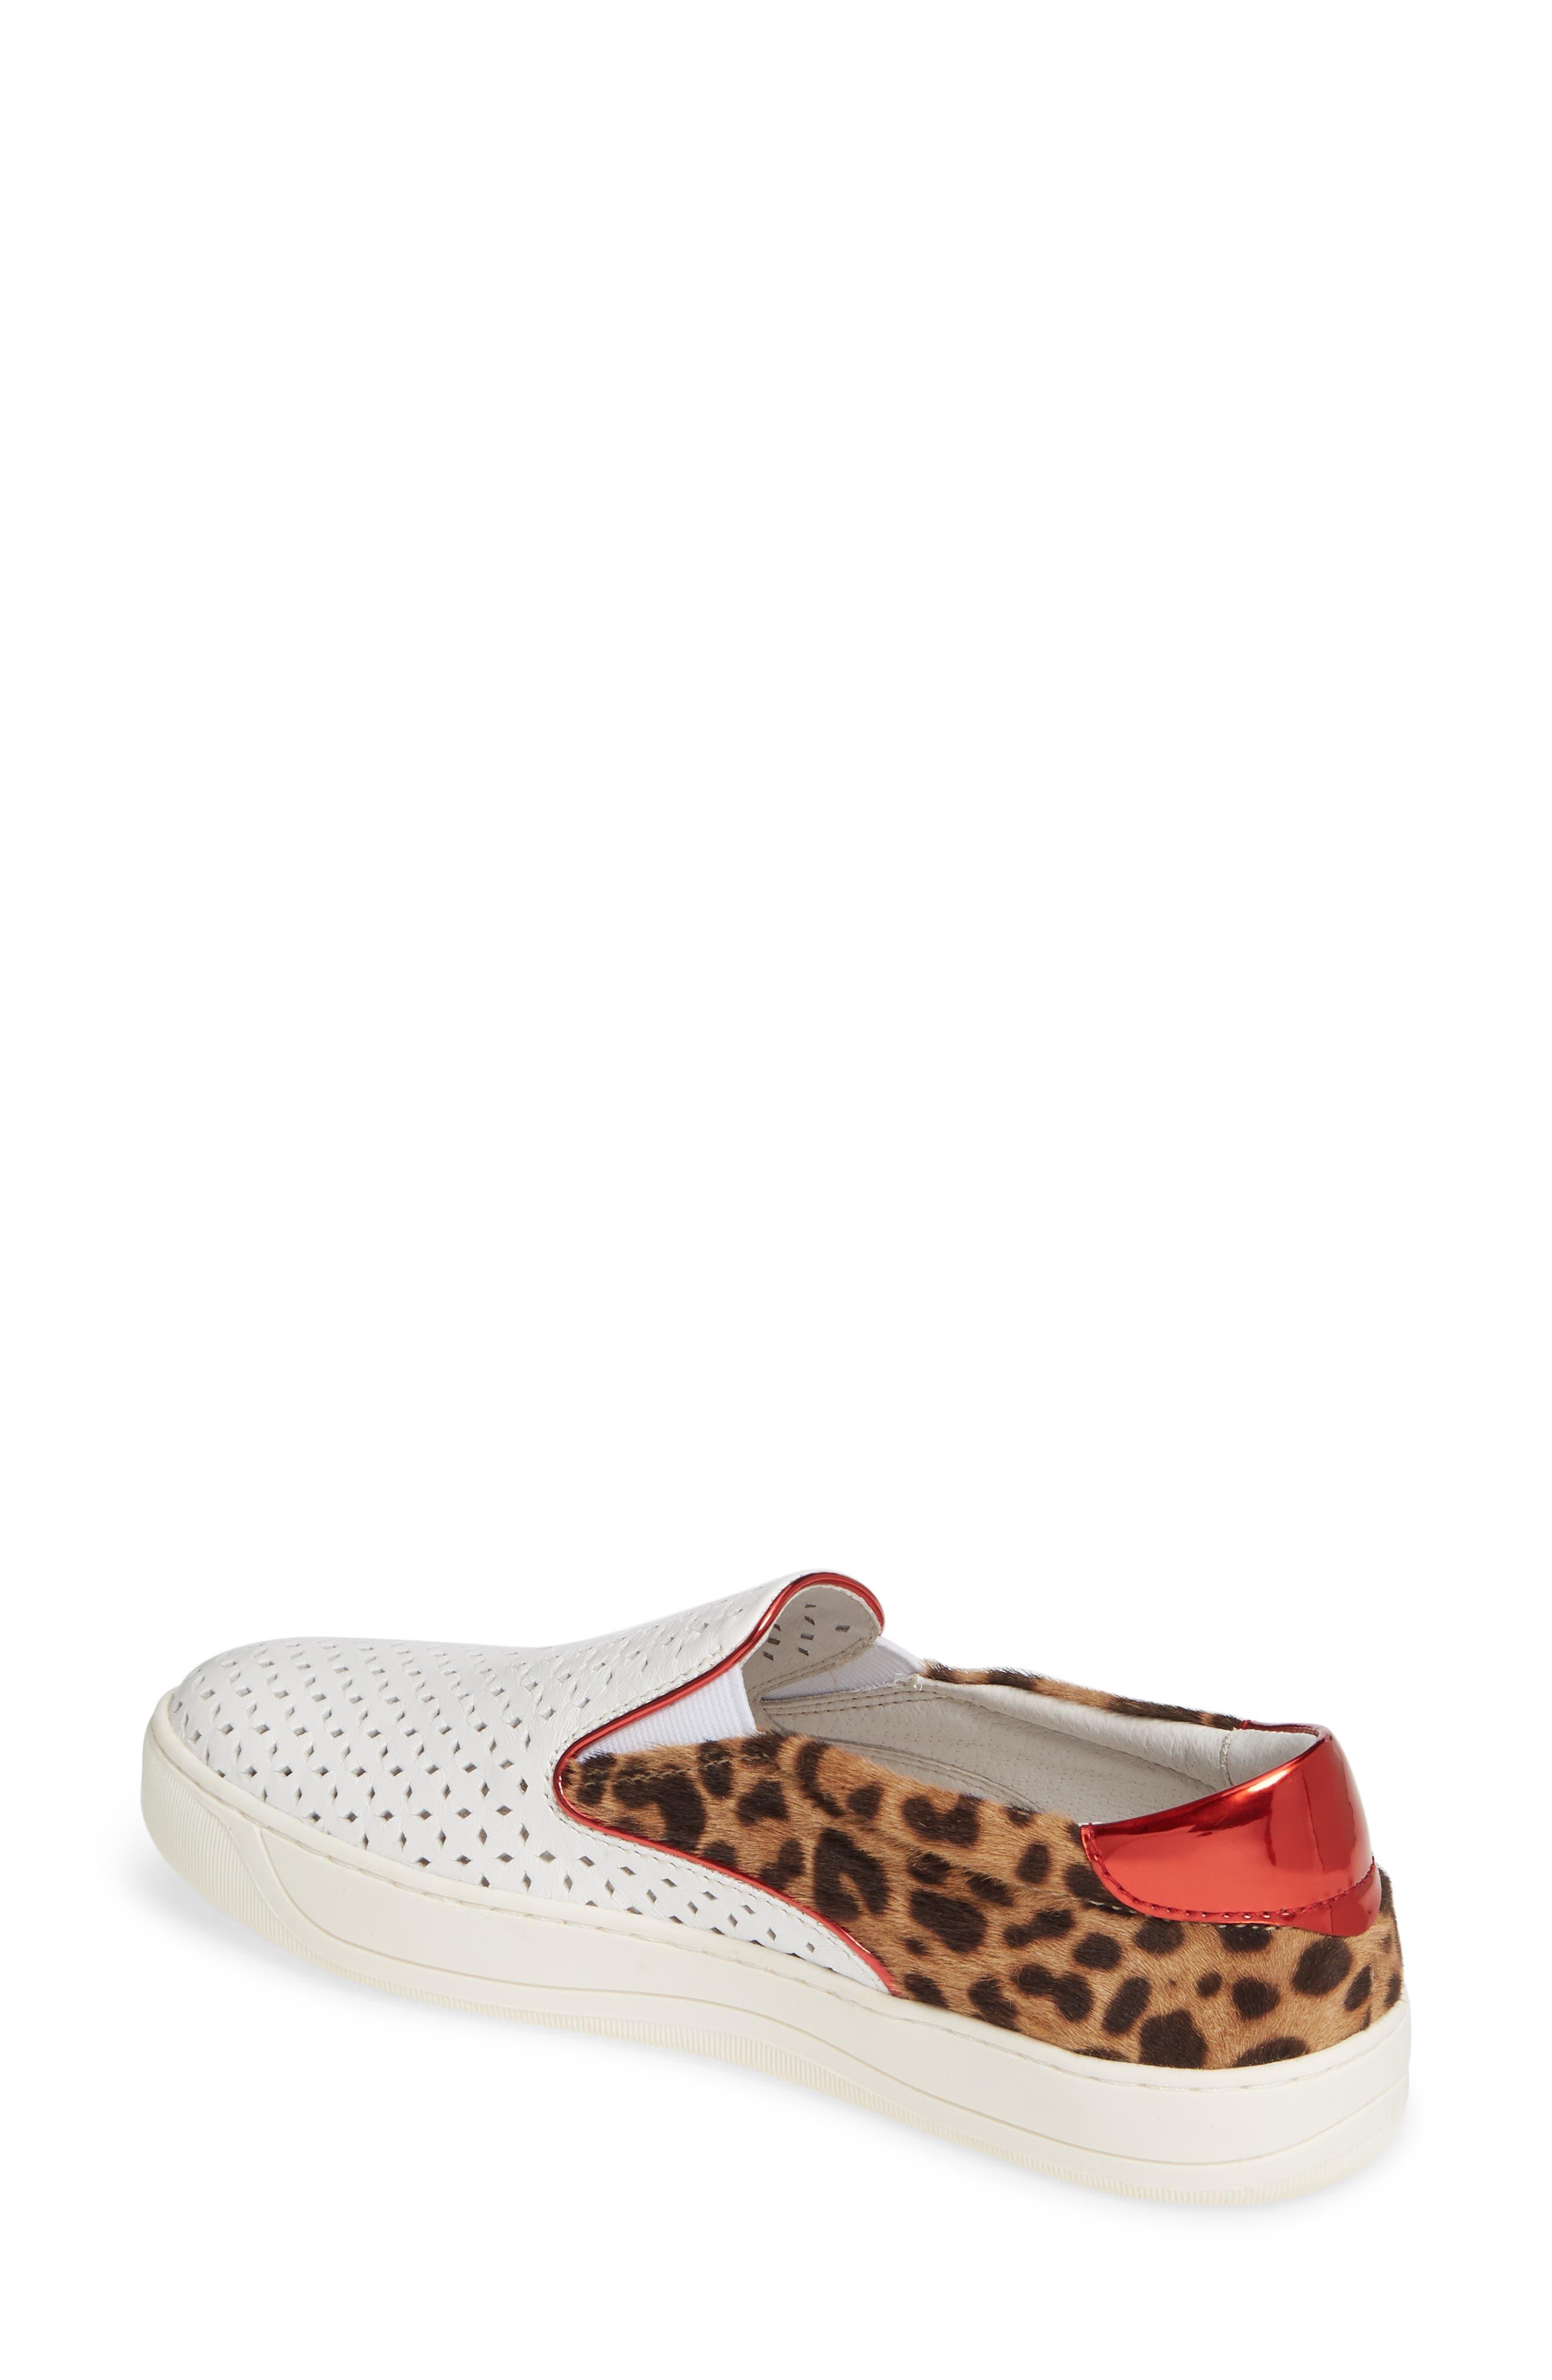 ,                             Elaine Perforated Genuine Calf Hair Slip-On Sneaker,                             Alternate thumbnail 2, color,                             WHITE LEATHER/ PRINT CALF HAIR